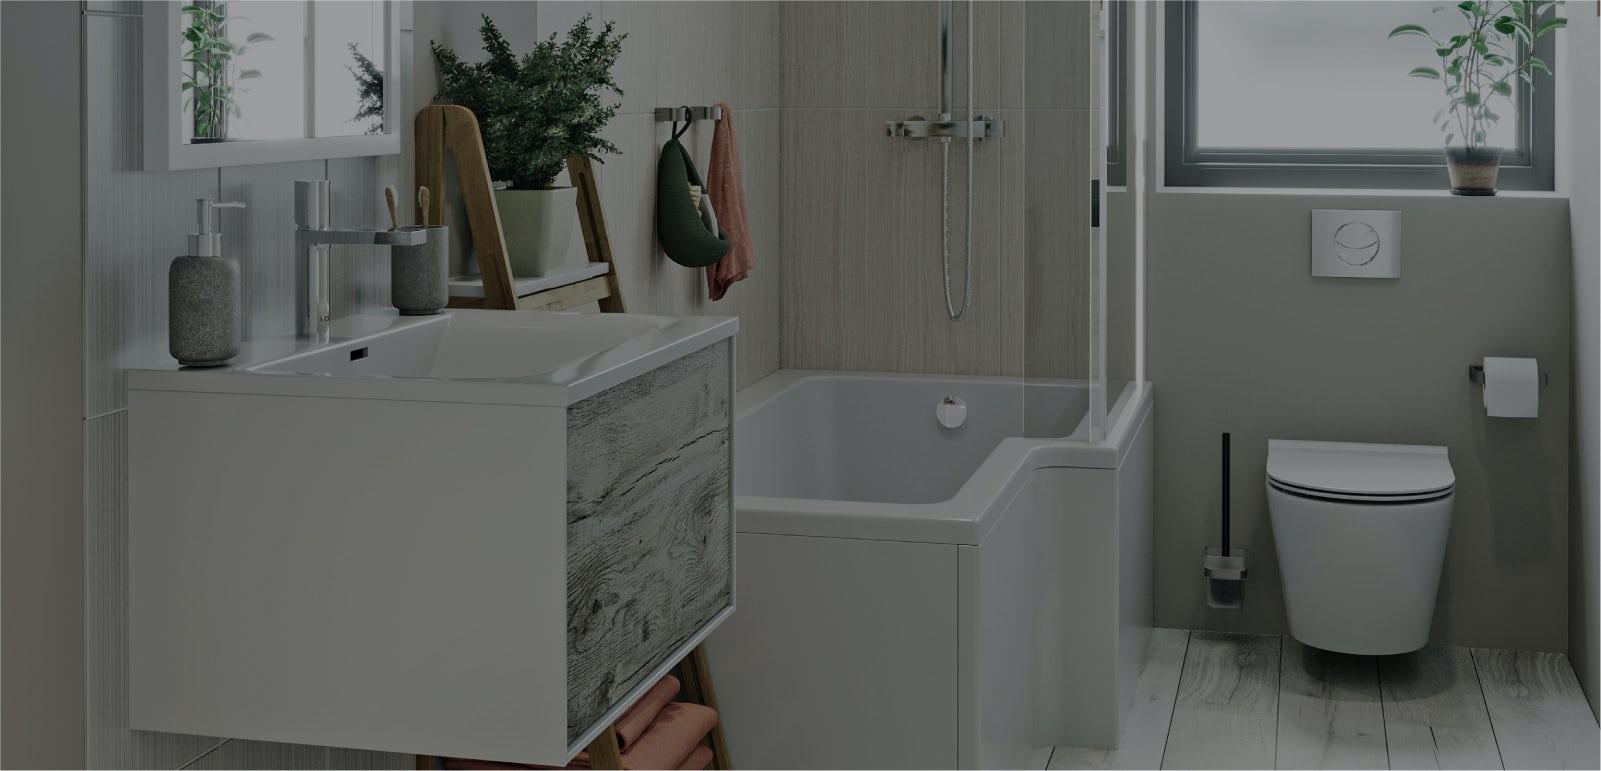 Bathroom Ideas: Lagom—the new Scandi style part 2